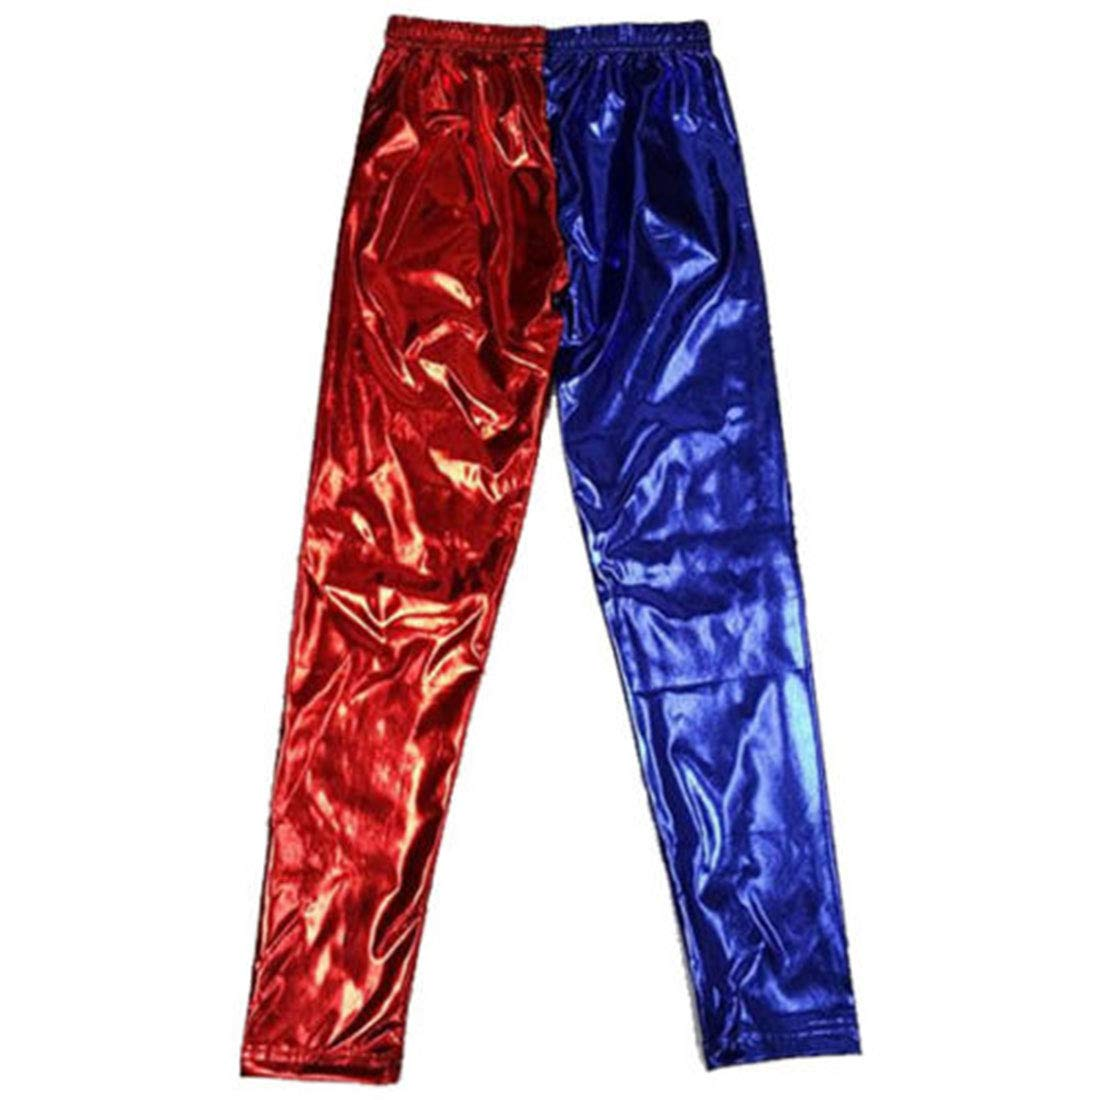 Loxdonz Girls Kids Disco Metallic Shiny Dance Leggings Pants Footless Age 3-13 Years